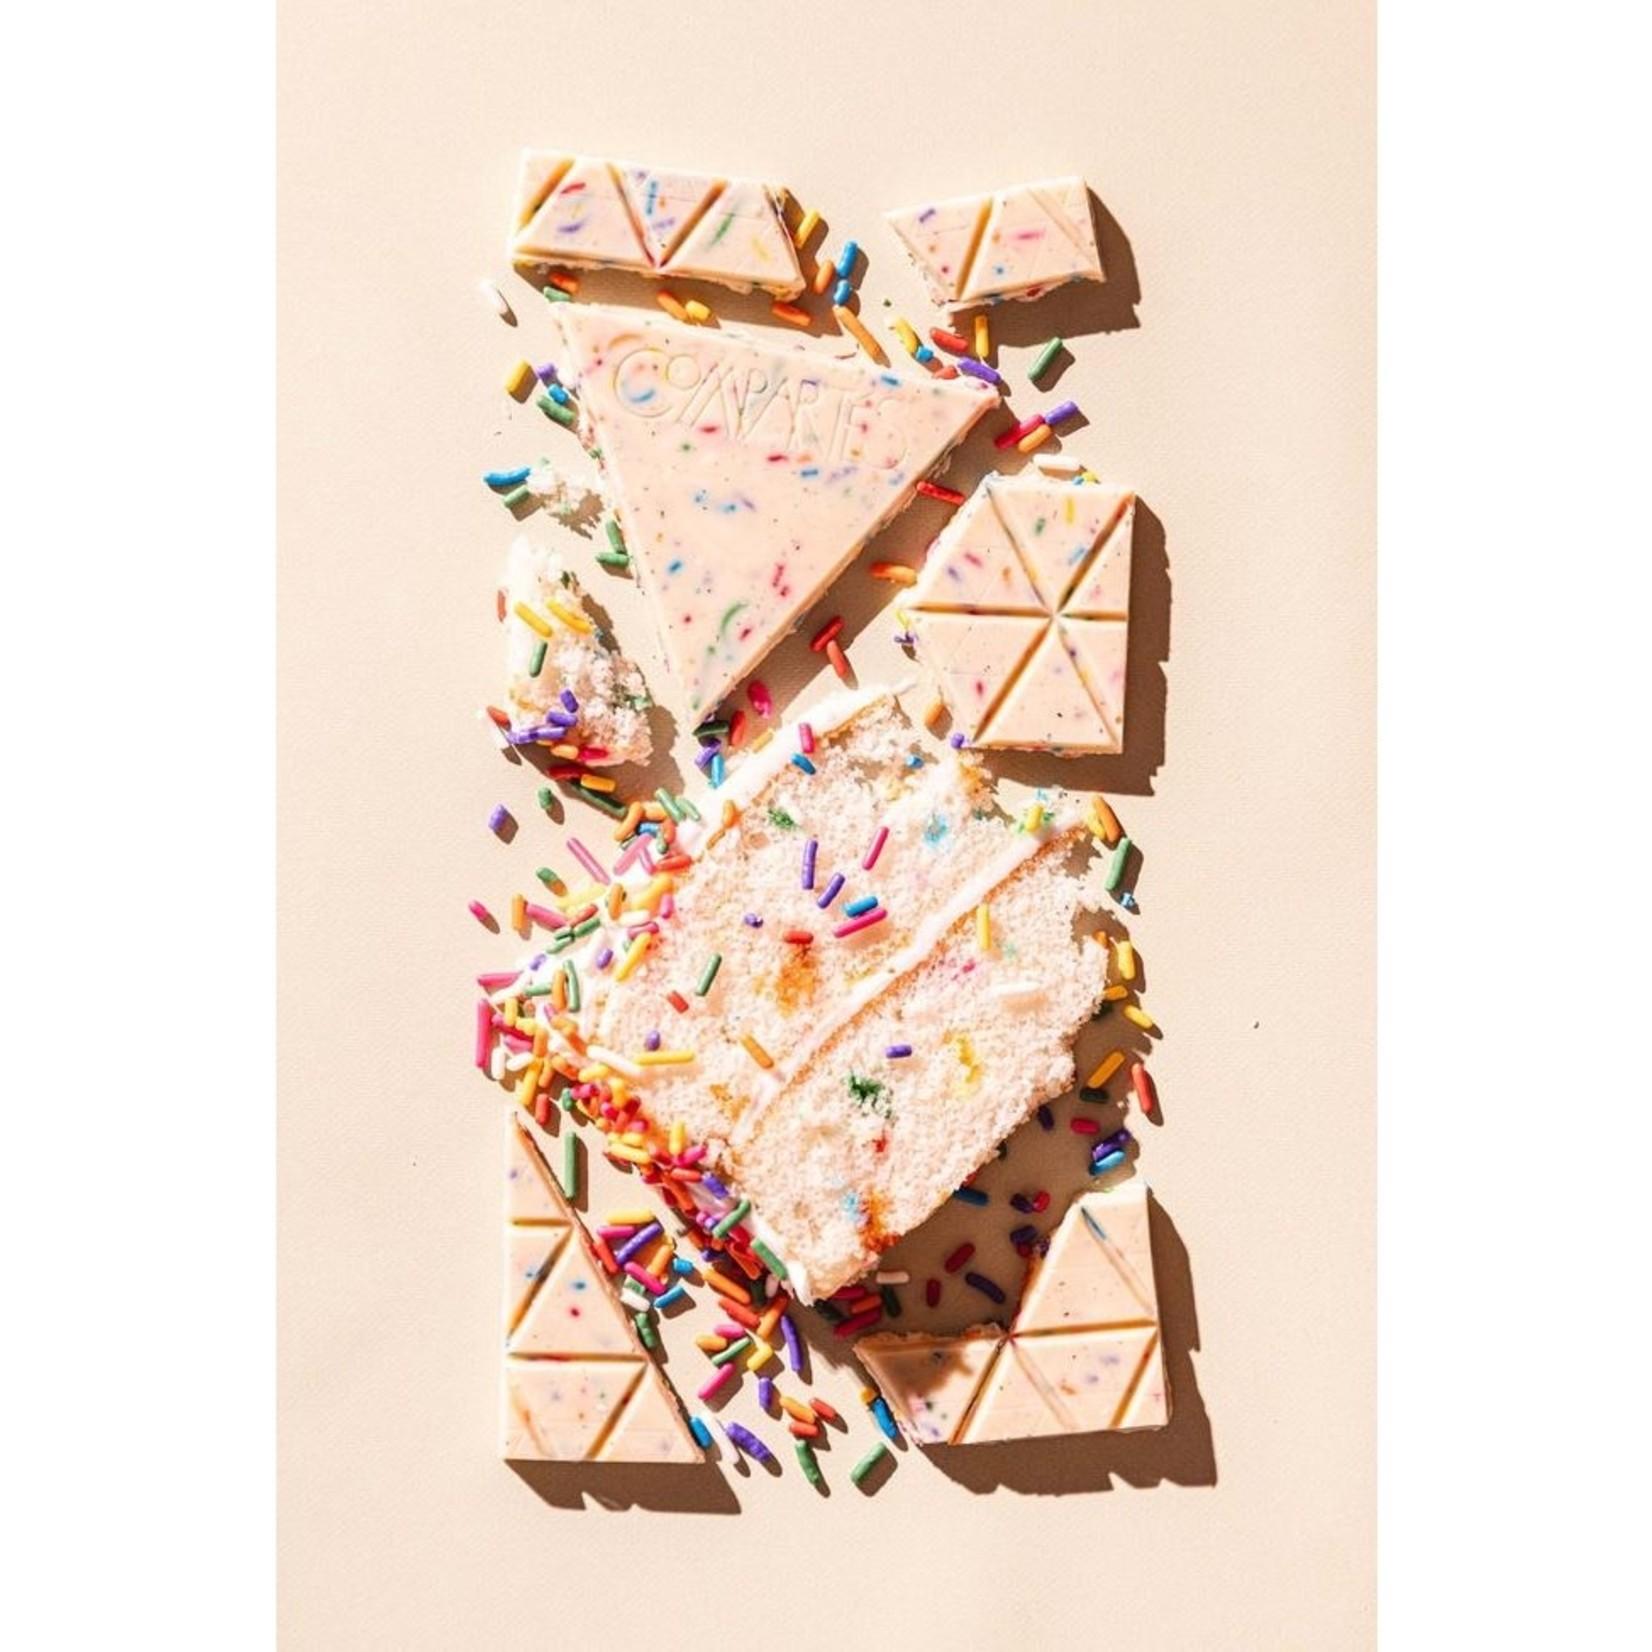 Compartes Chocolate Compartes Birthday Cake Chocolate Bar